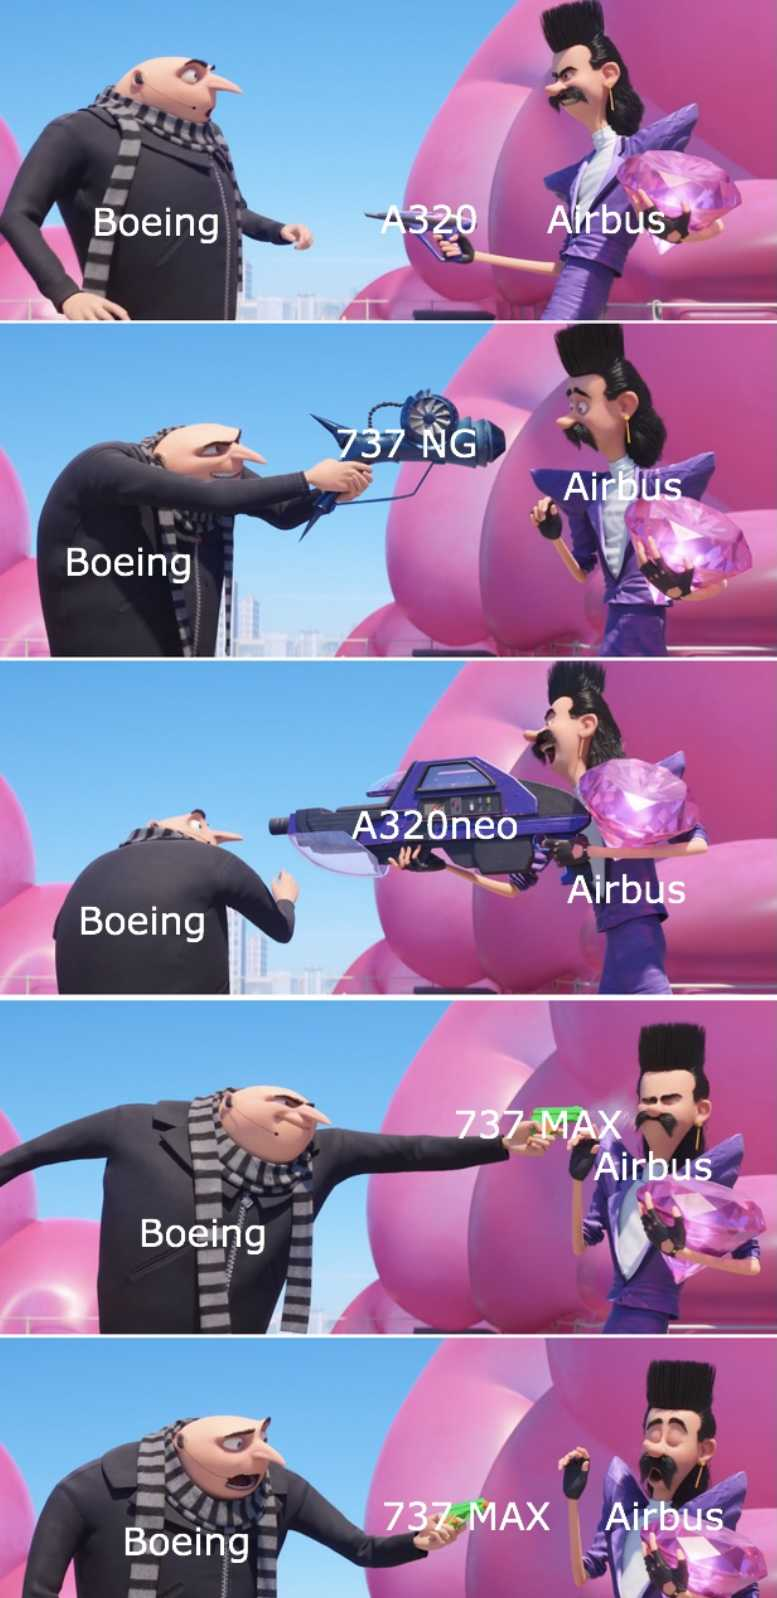 funny 737 max memes - boeing vs airbus